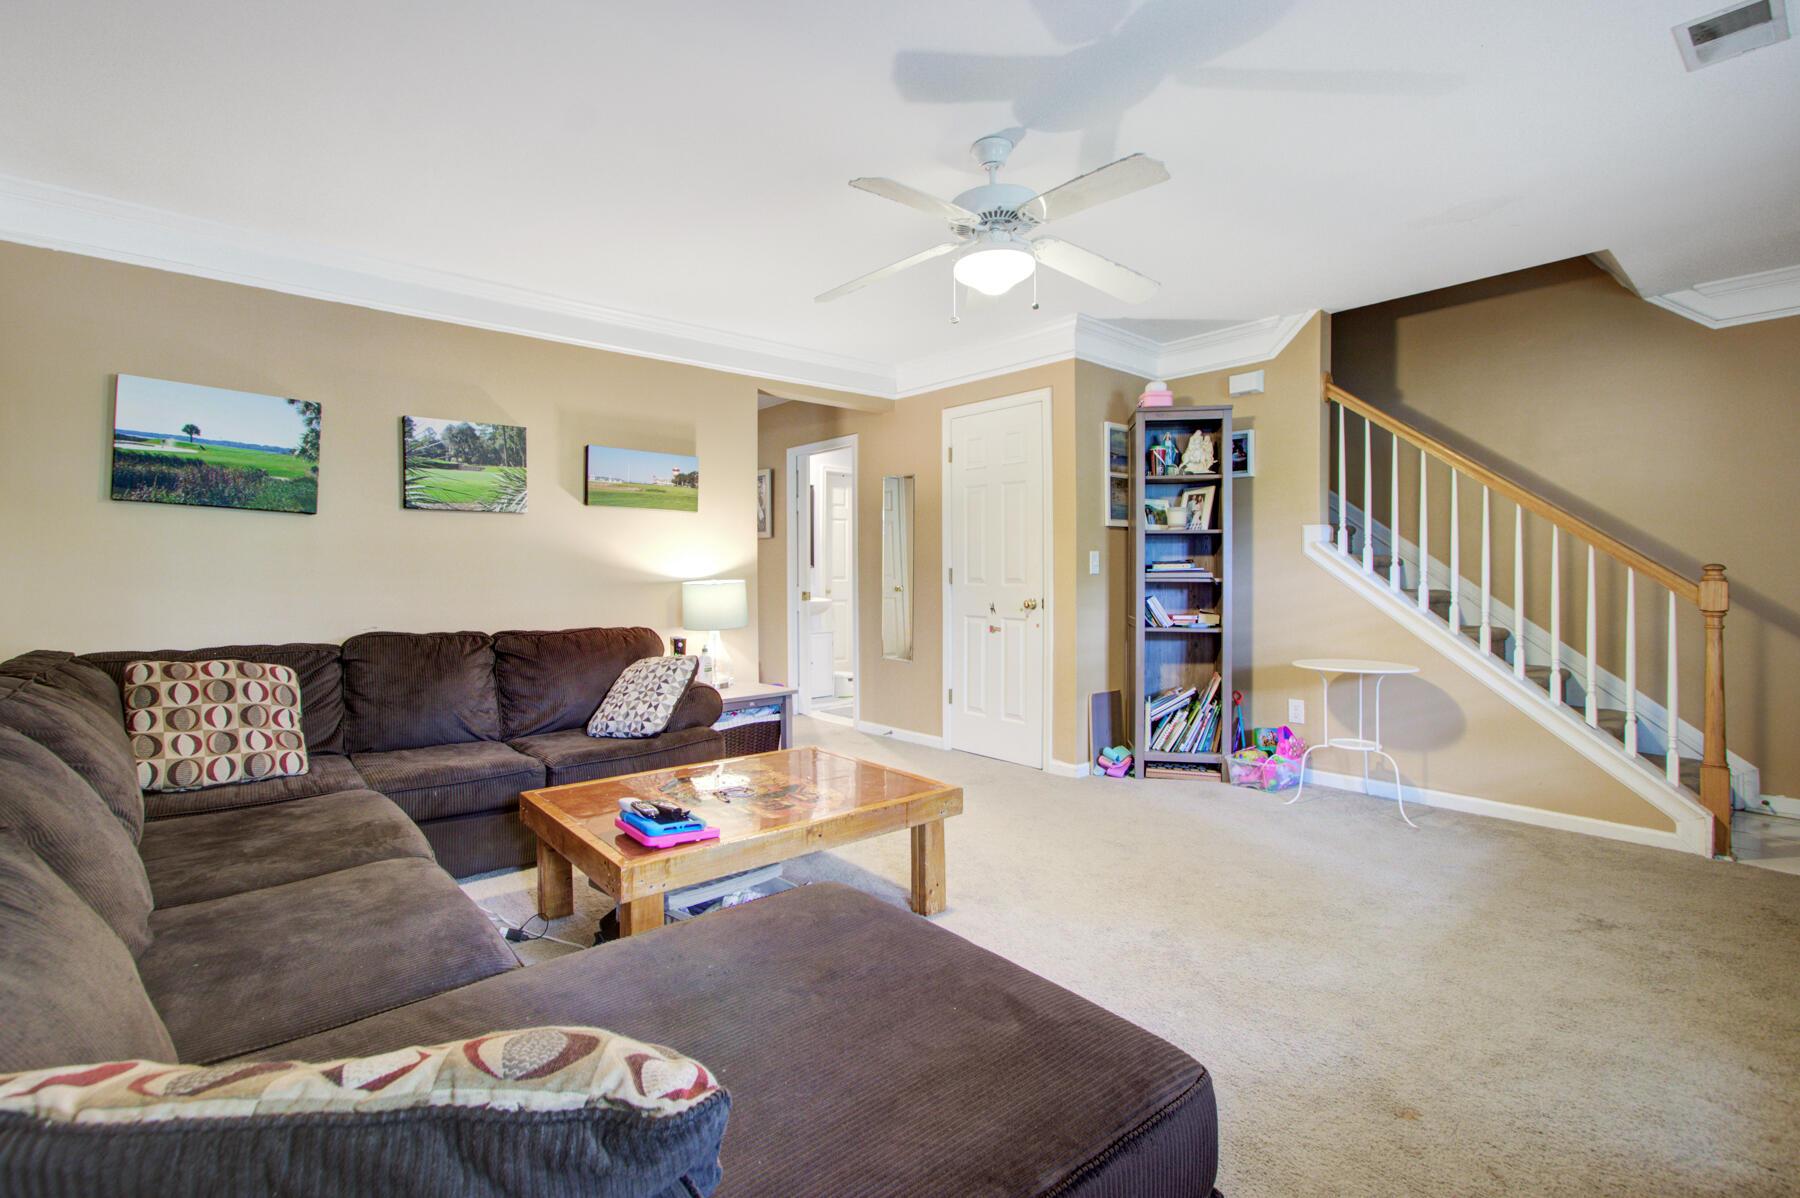 Dunes West Homes For Sale - 2232 Kings Gate, Mount Pleasant, SC - 32